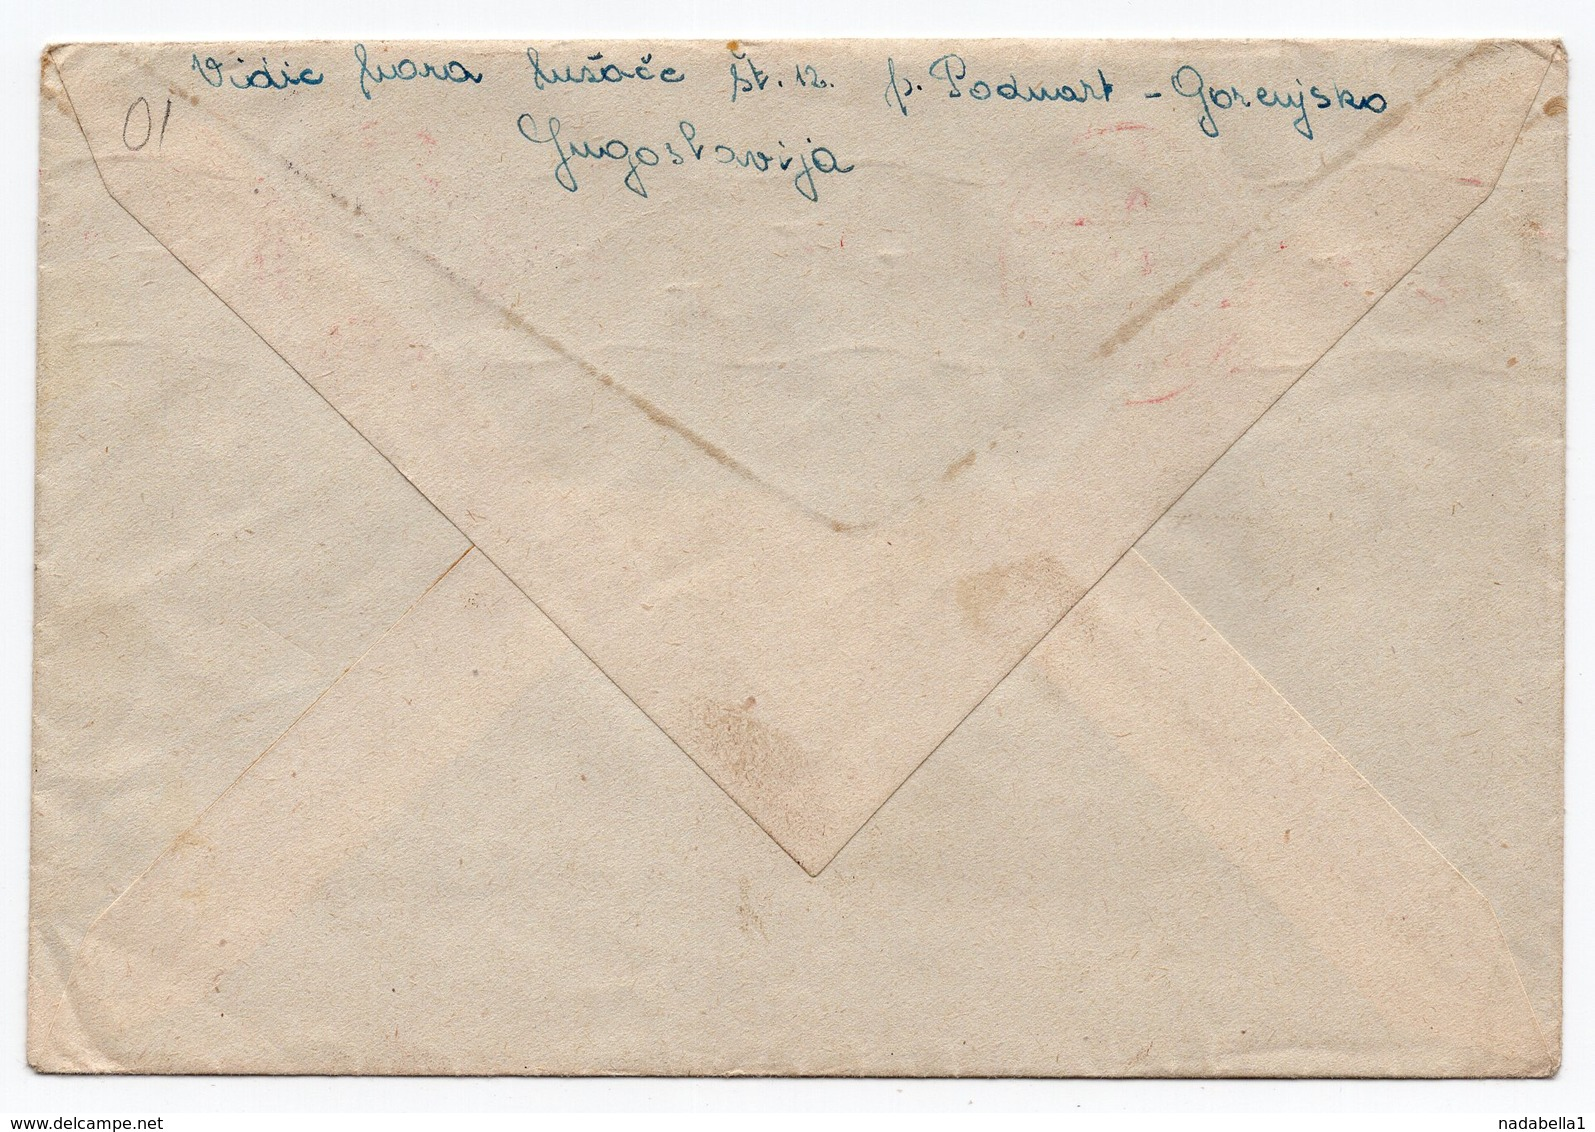 1947 YUGOSLAVIA, SLOVENIA, PODNART TO GERMANY, CENSORED, US CIVIL CENSORSHIP, MUNICH - 1945-1992 Socialist Federal Republic Of Yugoslavia